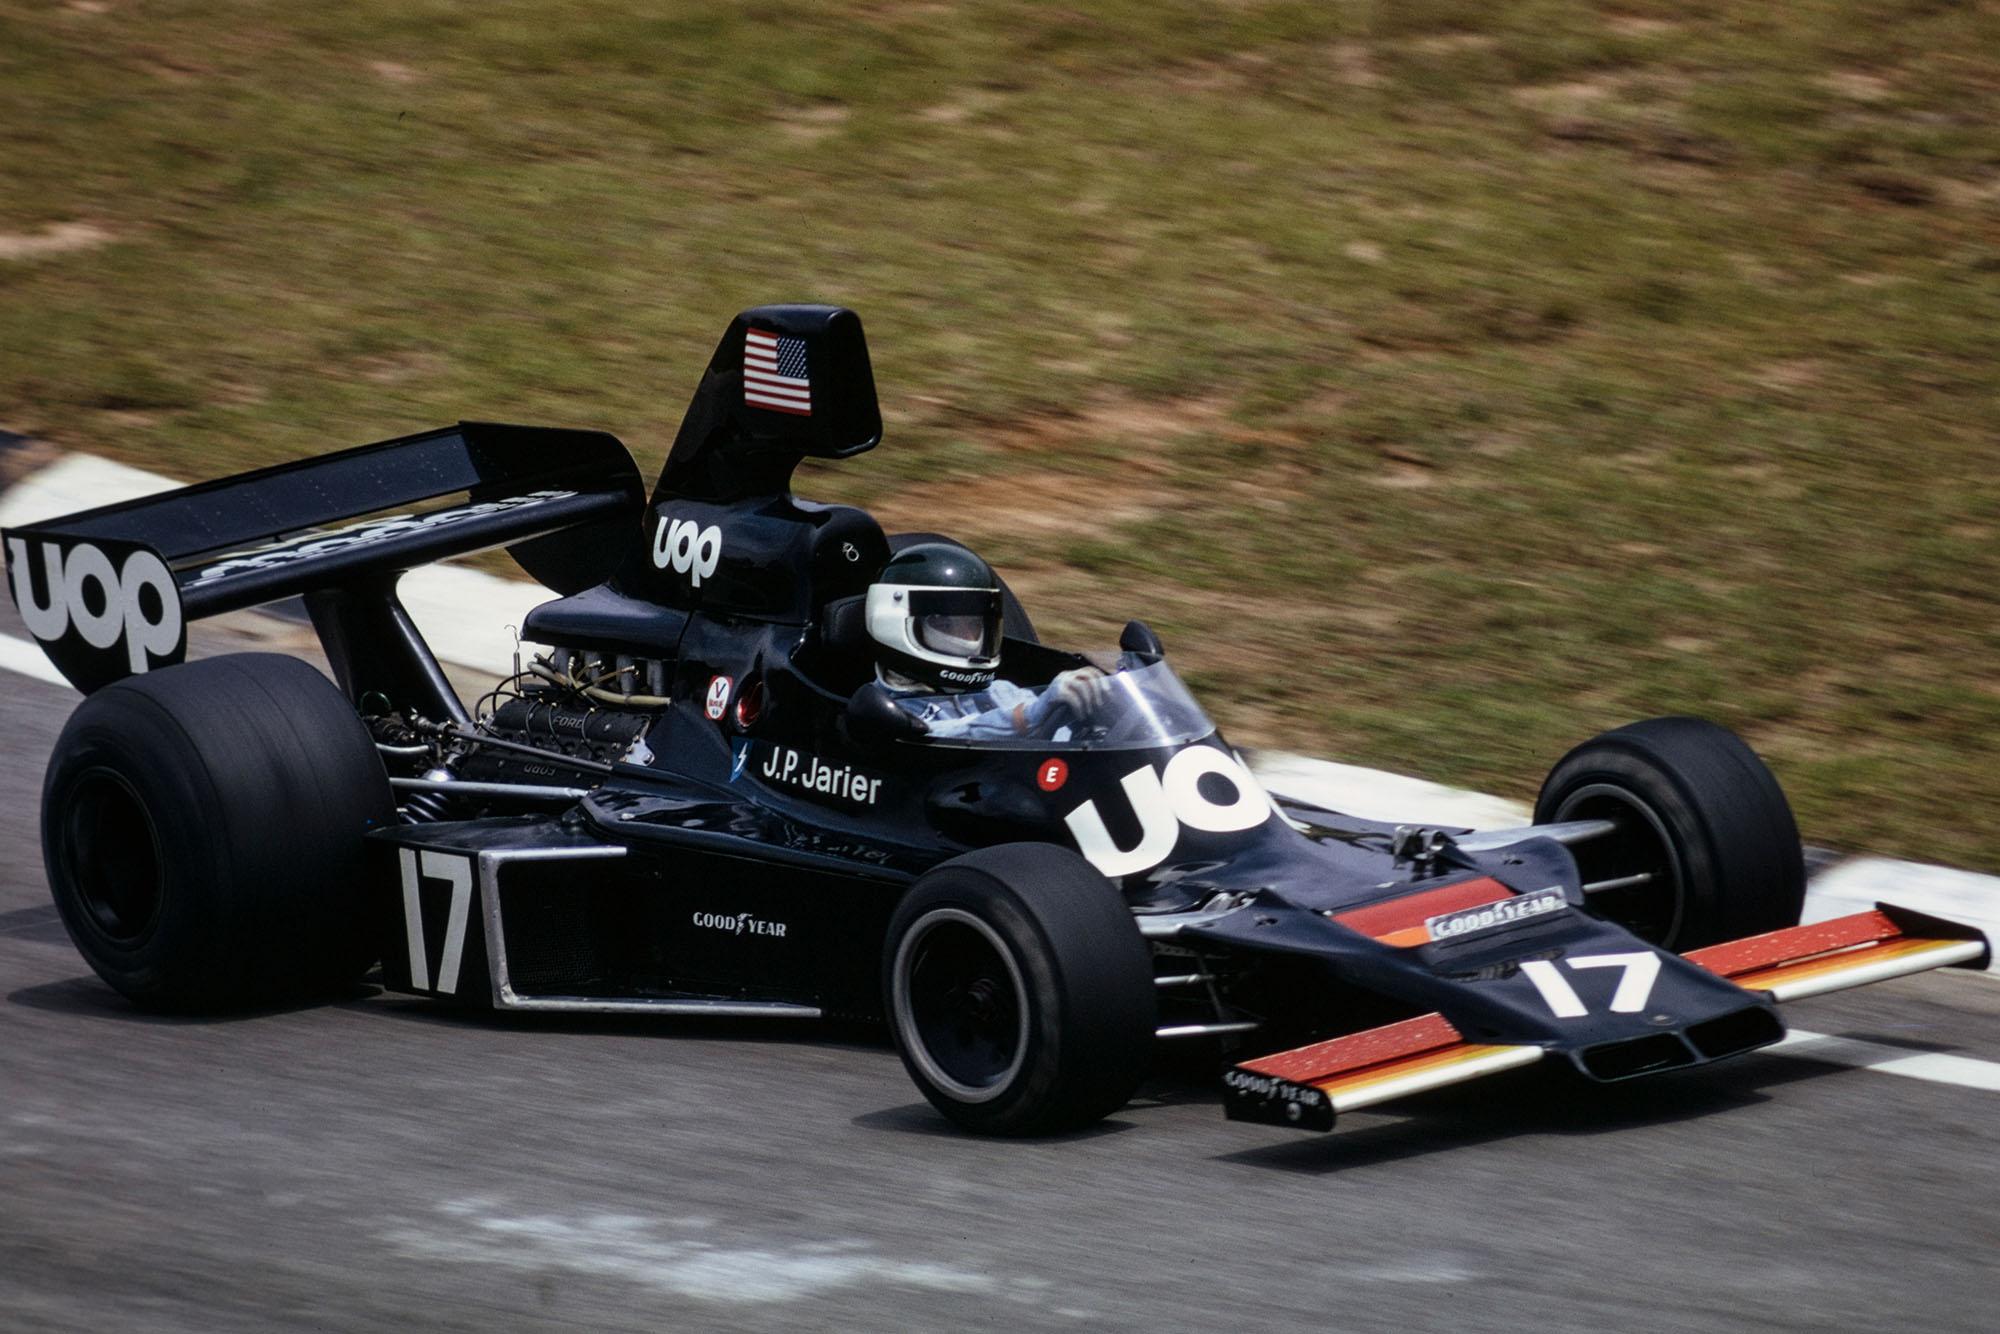 Jean-Pierre Jarier driving for Shadow at the 1975 Brazilian Grand Prix, Interlagos.